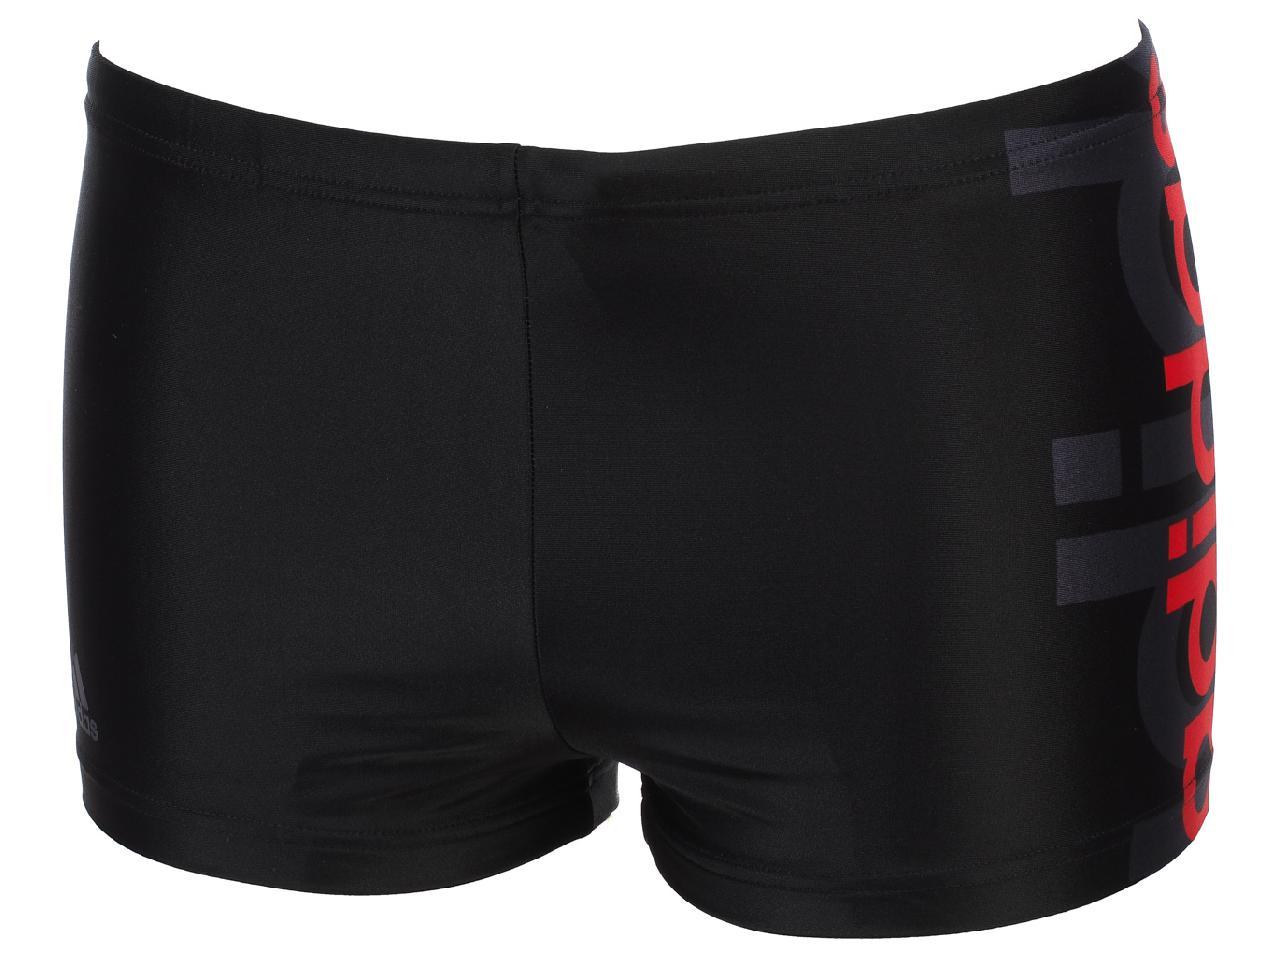 Boxer-Swimsuit-Adidas-Inf-Ecad-Bx-Black-Black-Boxer-57949-New thumbnail 4